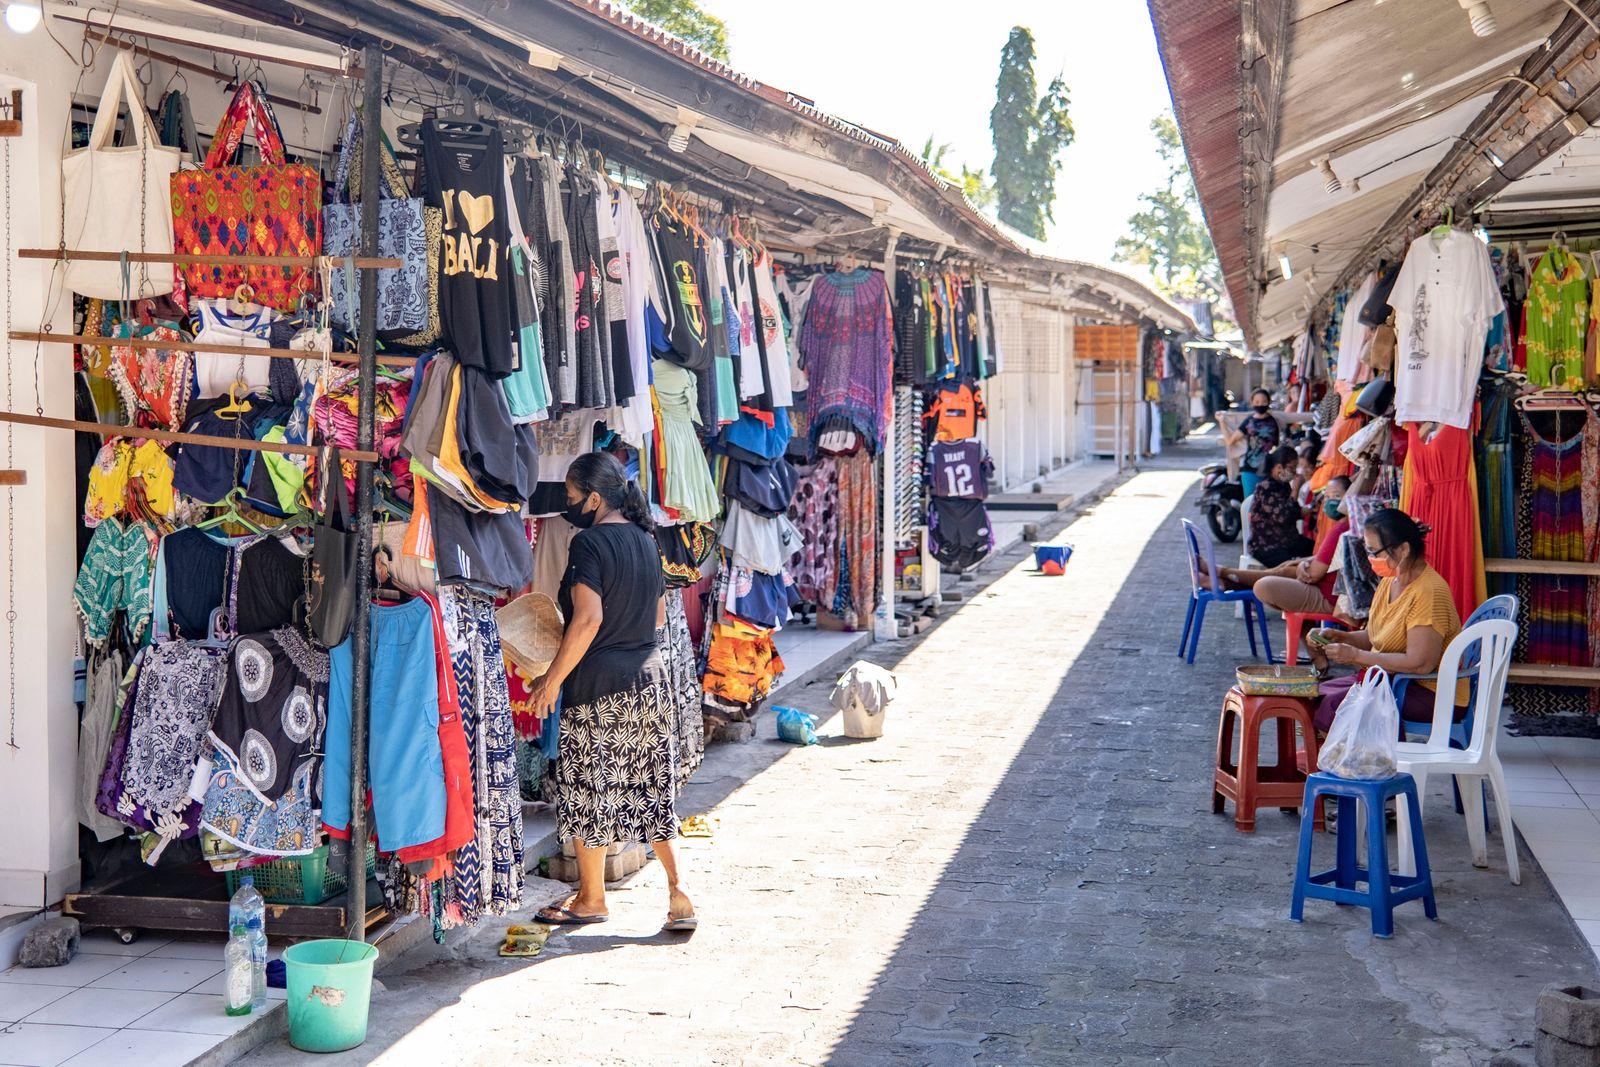 Tourism amid coronavirus pandemic in Bali, Denpasar, Indonesia - 25 Aug 2020